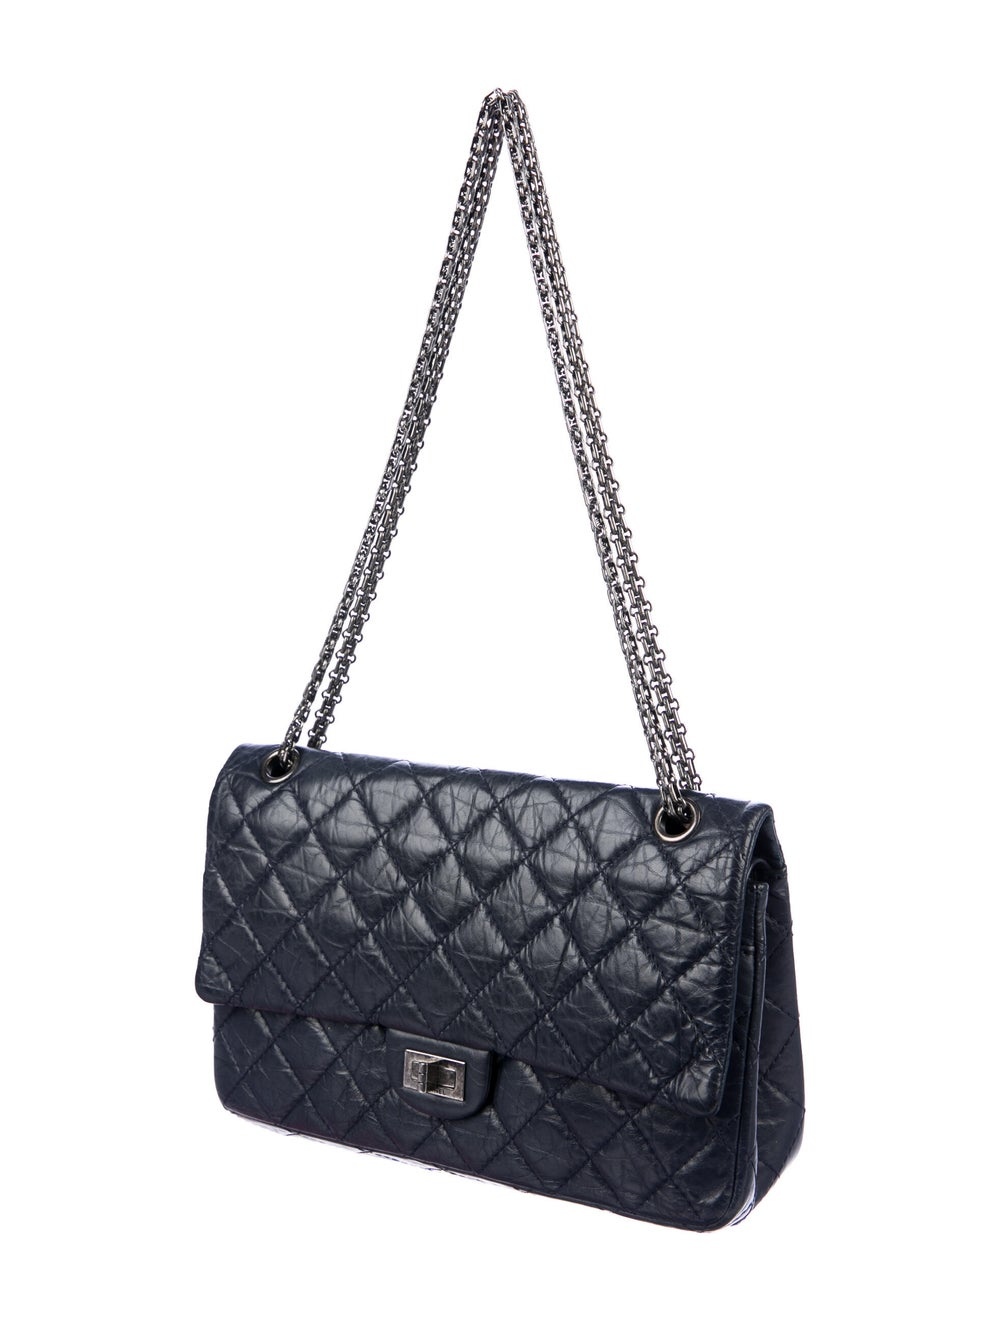 Chanel Reissue 226 Double Flap Bag Blue - image 3